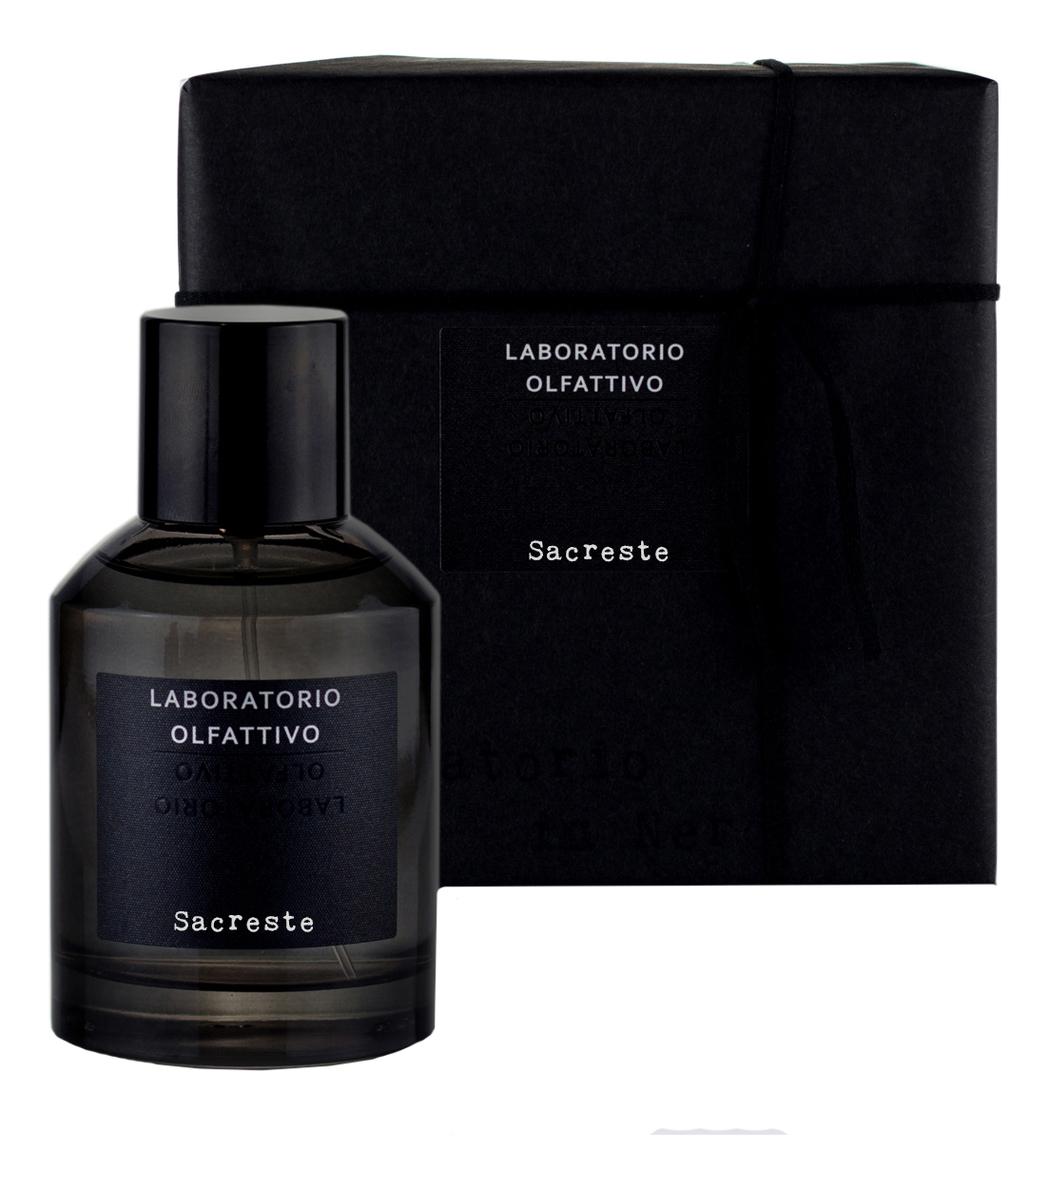 Купить Laboratorio Olfattivo Sacreste: парфюмерная вода 100мл